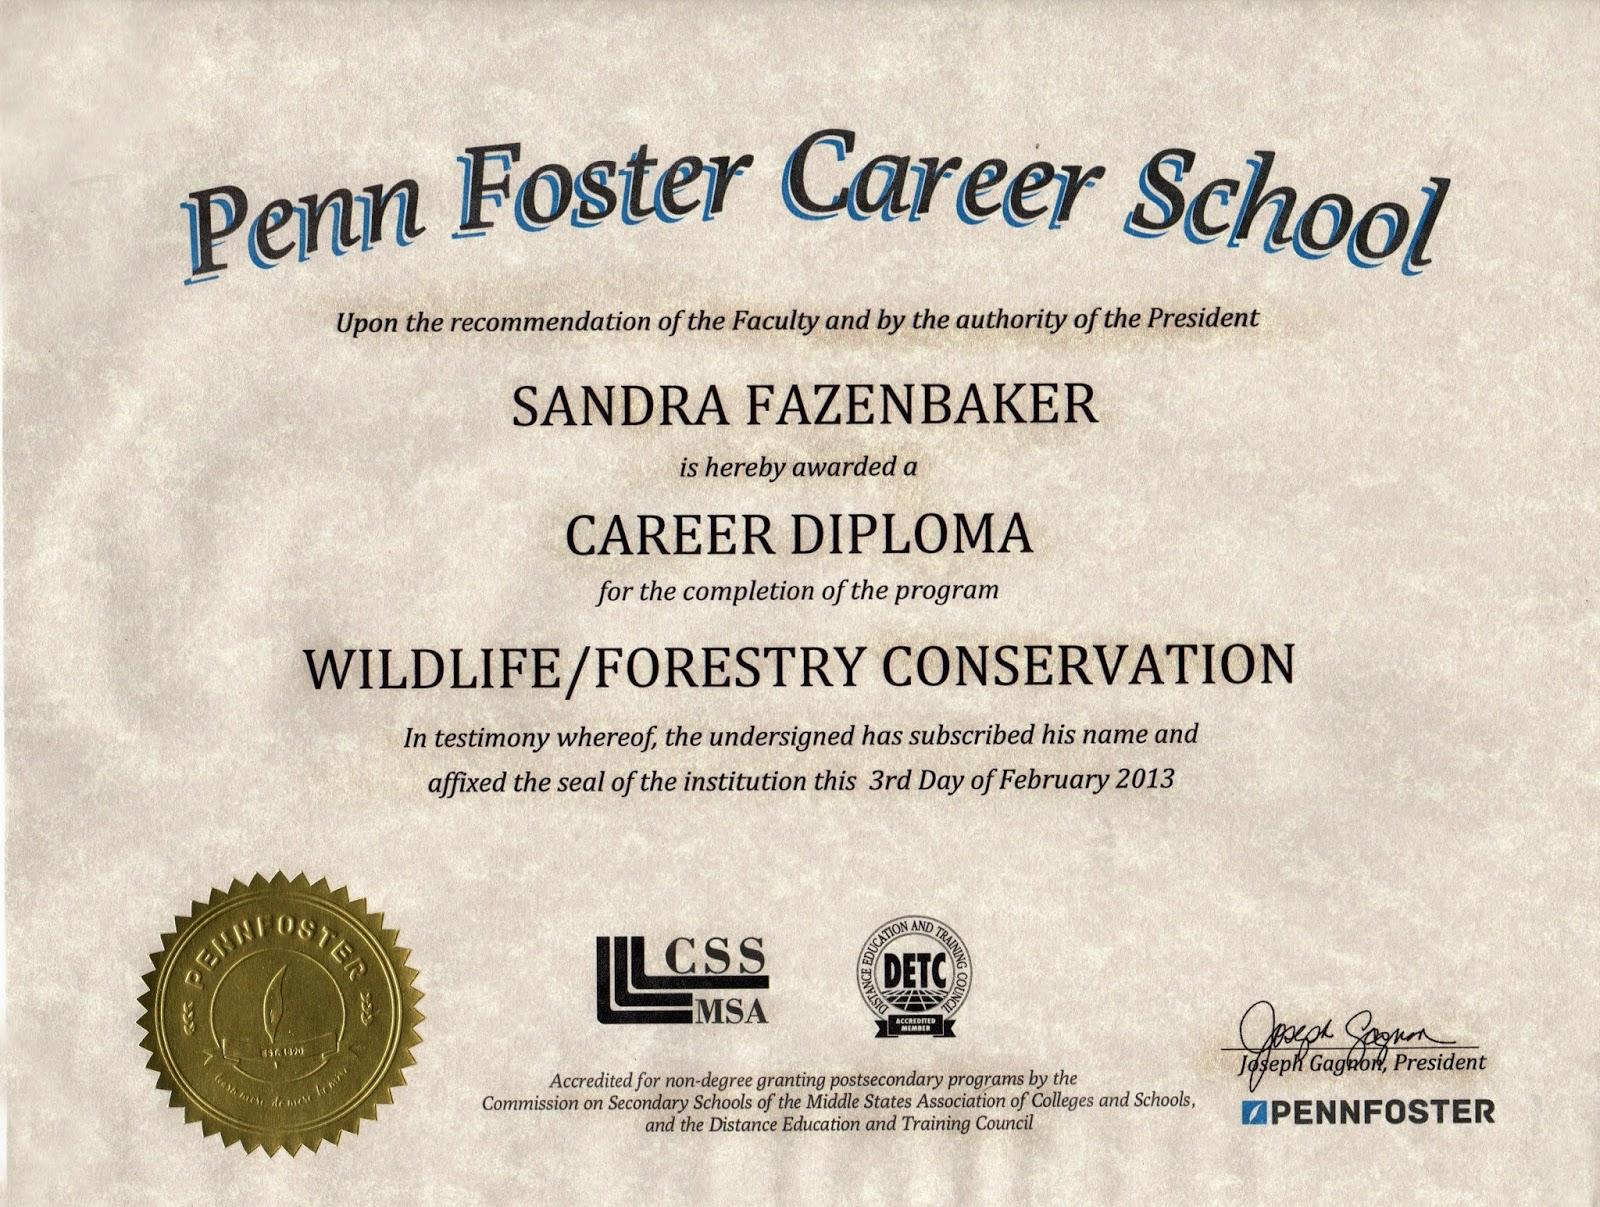 degree or diploma on job application